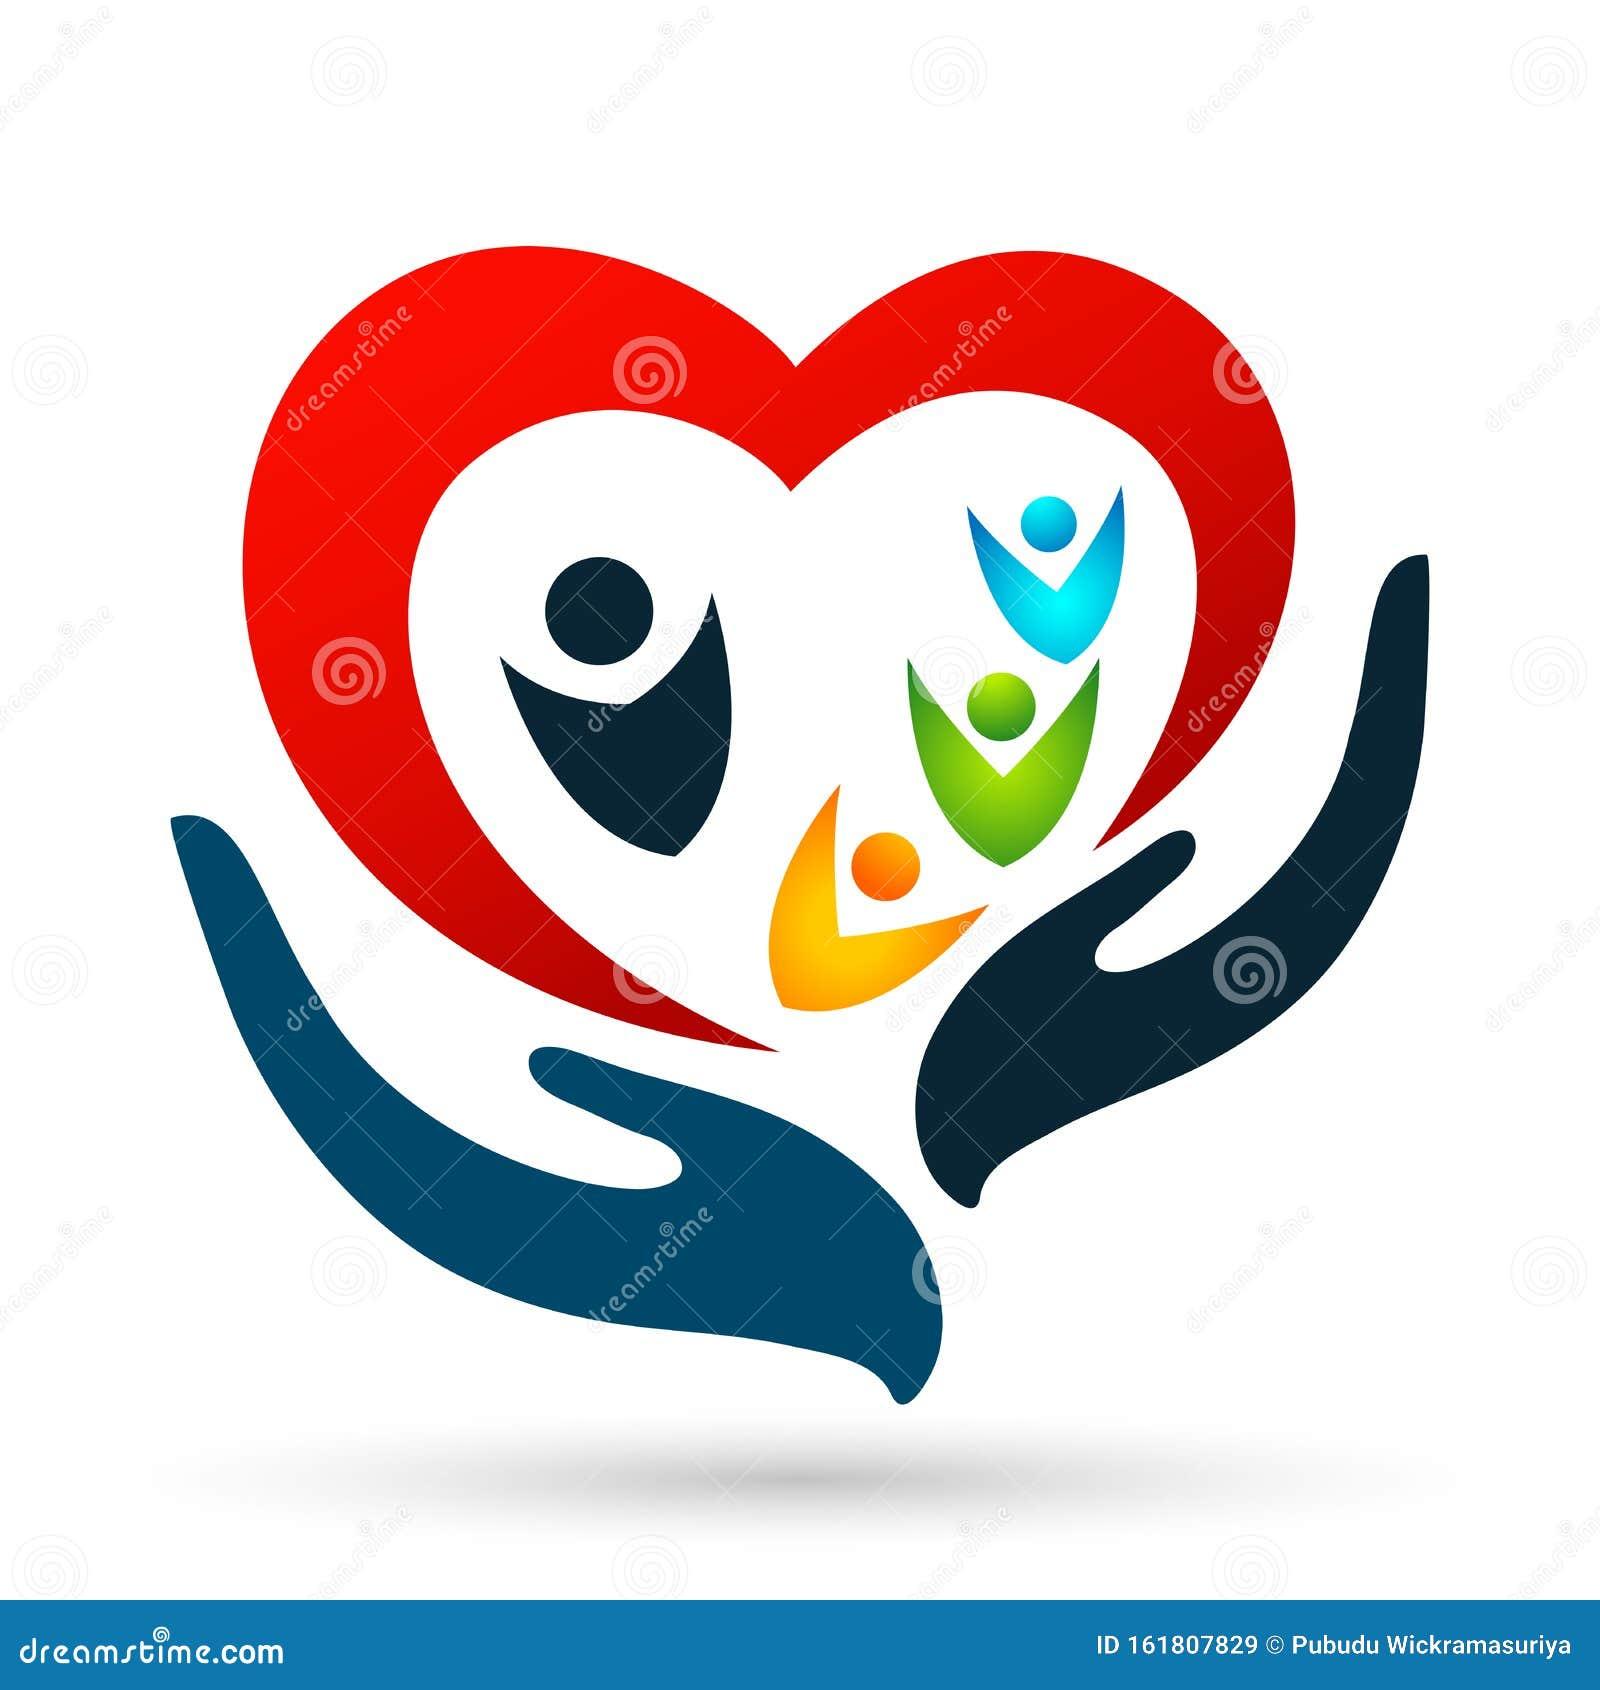 Family,parent,kid,heart, Logo ,parenting,care,circle,health